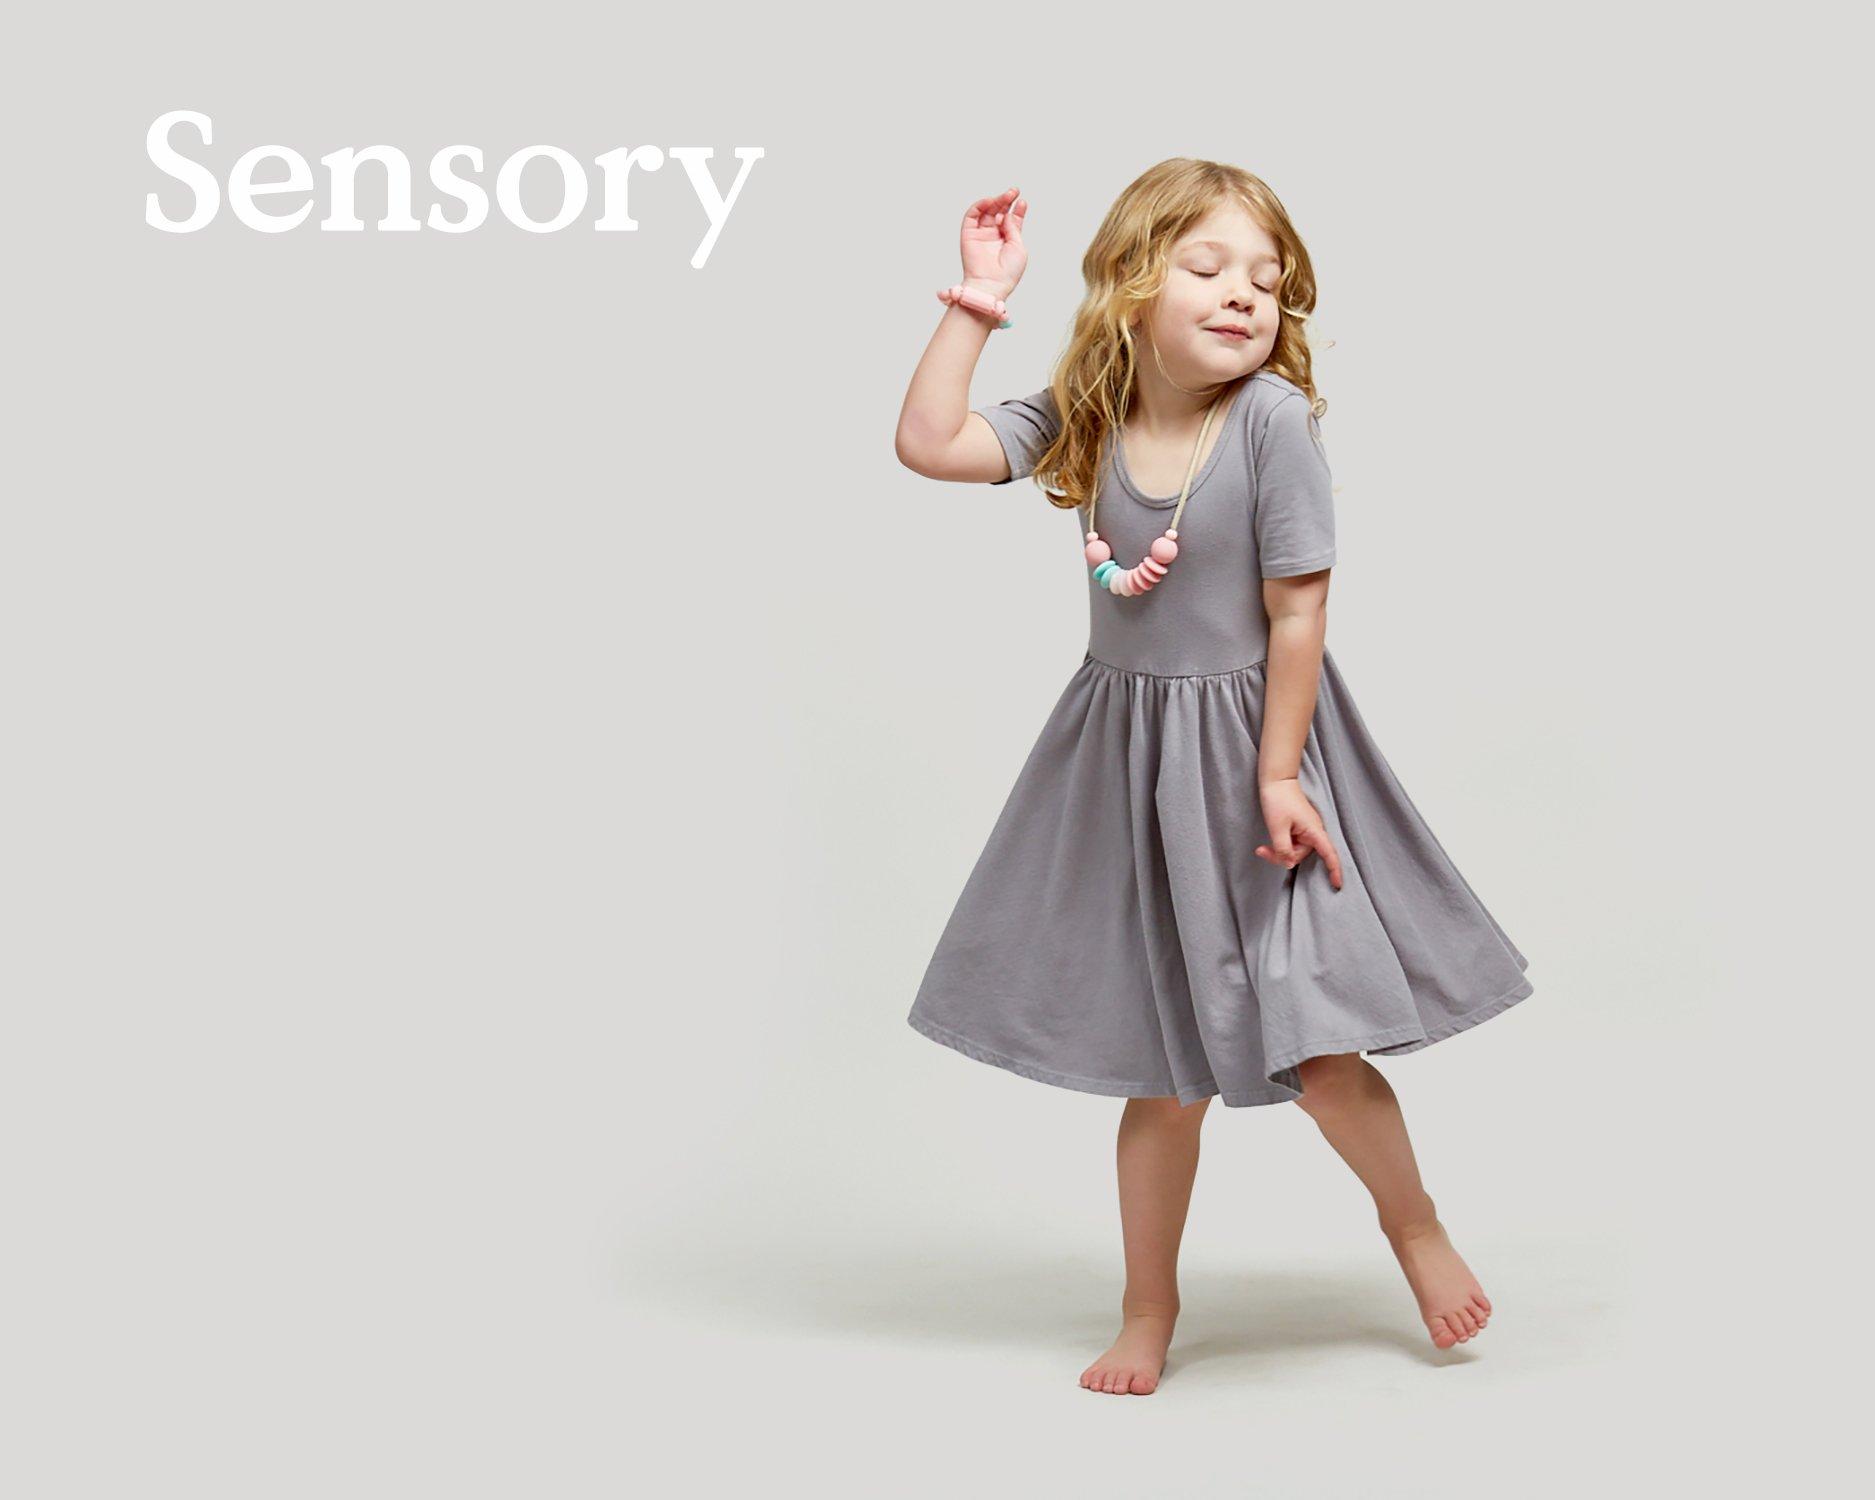 Sensory Home